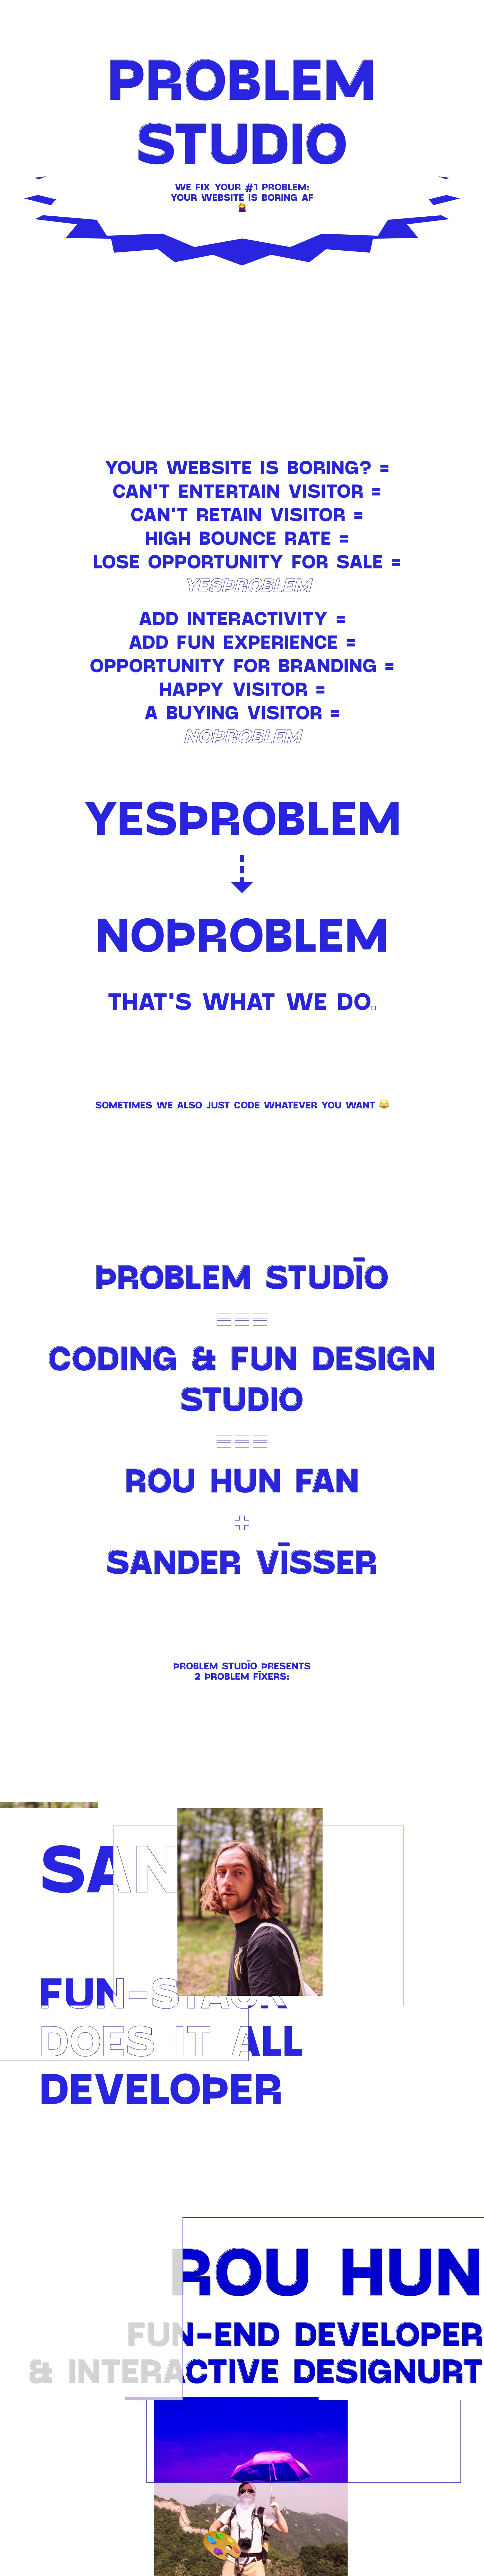 Problem Studio Website Screenshot